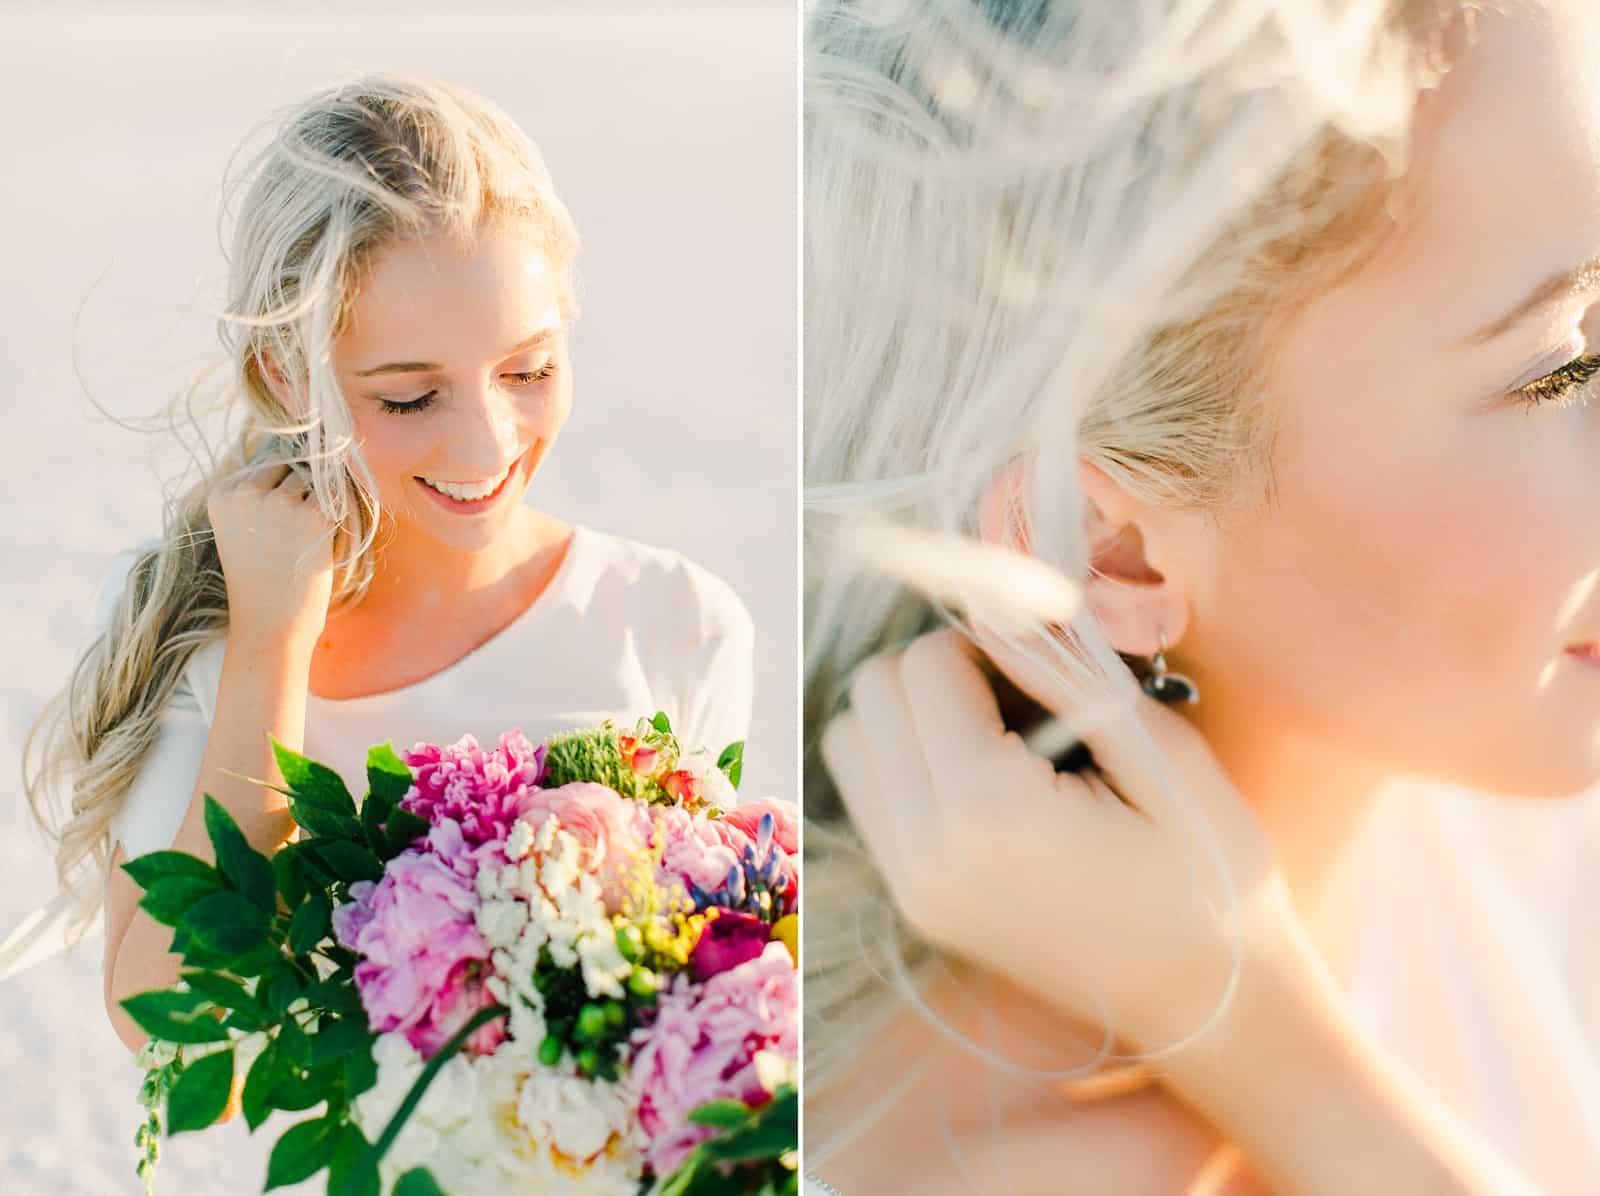 Bonneville Salt Flats Utah Wedding Photography, destination wedding, bride in modern simple white wedding dress, boho bride, pink and white wedding bouquet